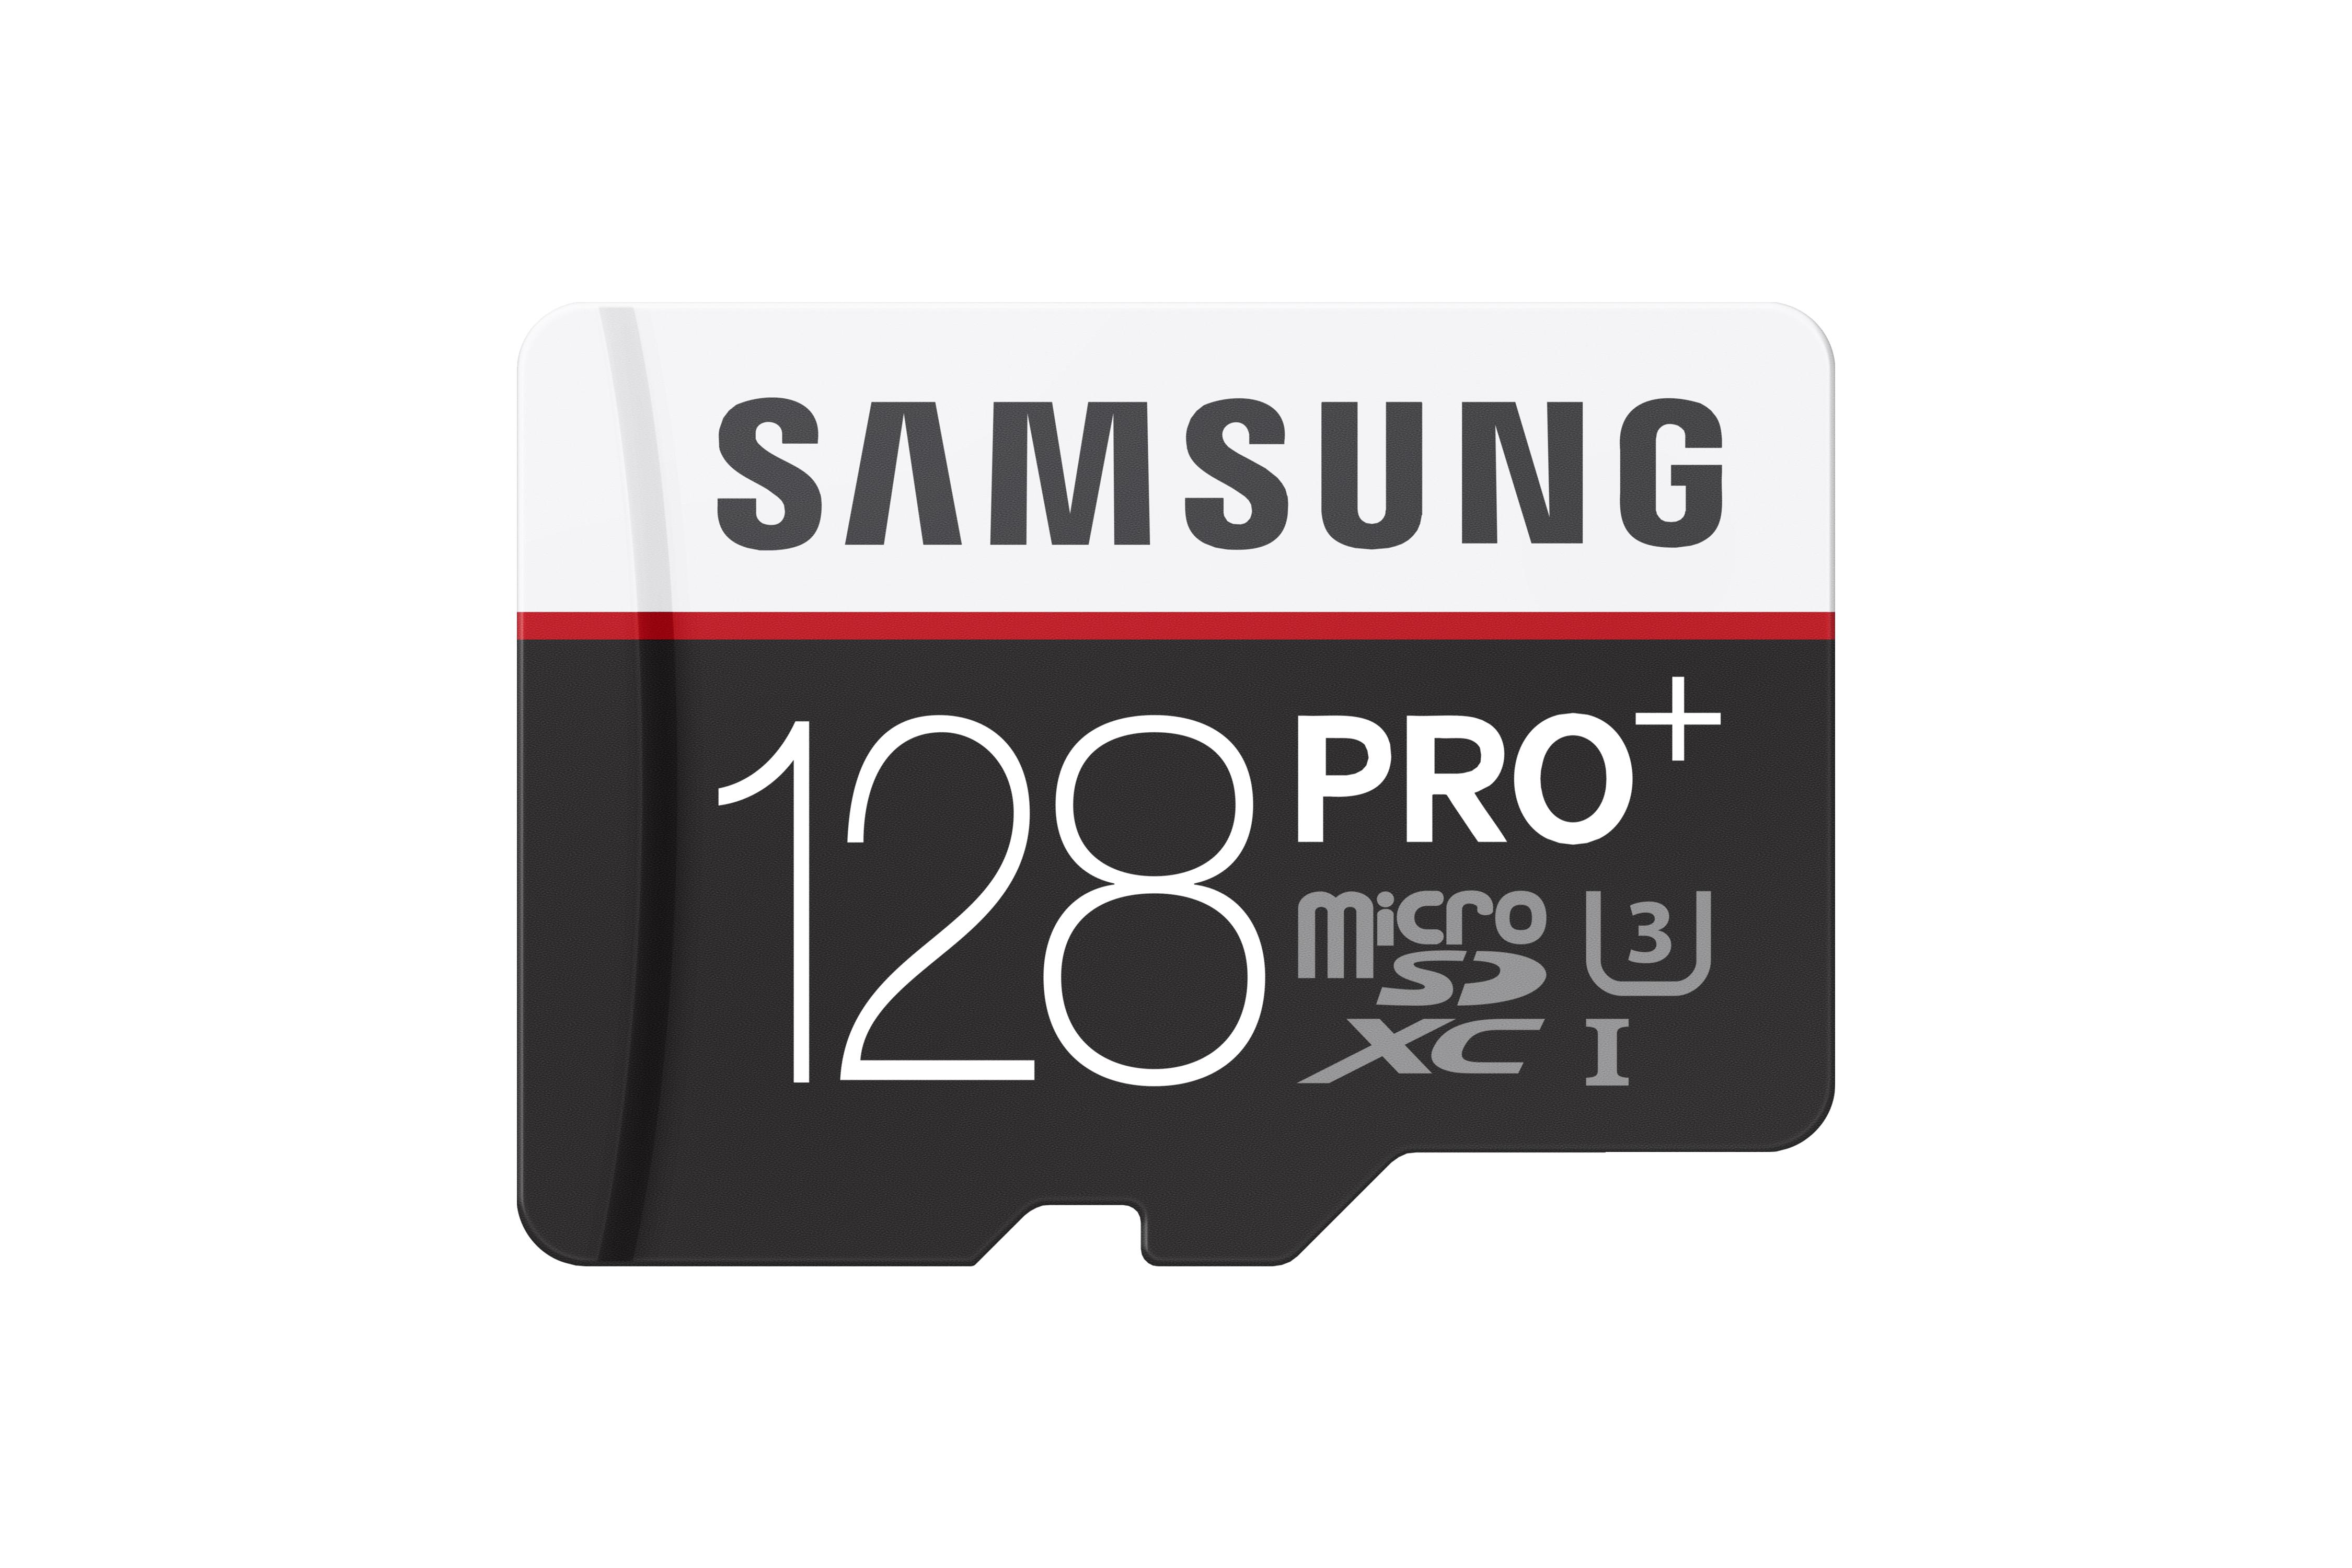 Samsung Electronics Raises the Bar with New PRO Plus 128GB ...